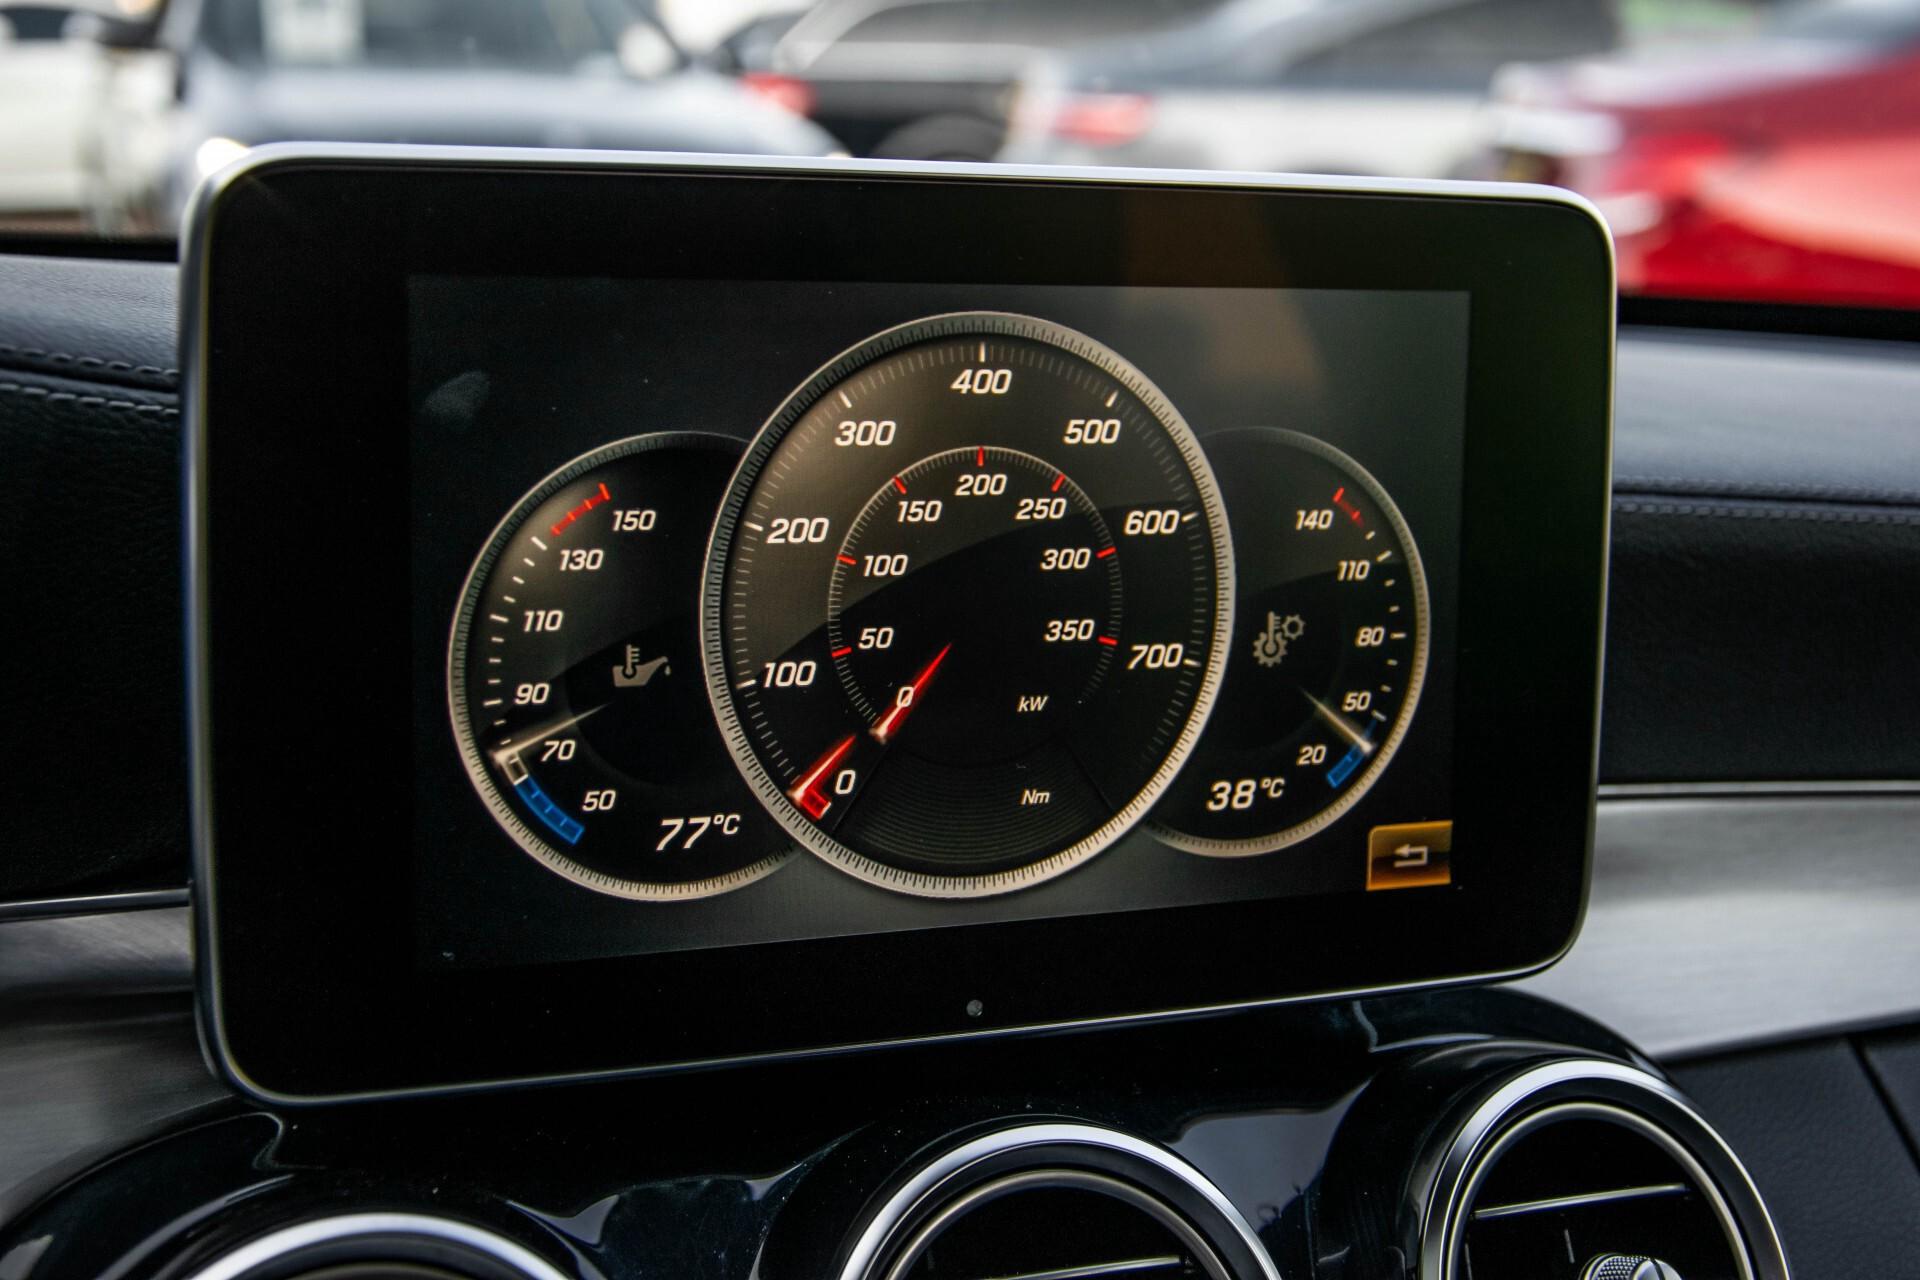 Mercedes-Benz C-Klasse 63 AMG S Panorama/Distronic/Keyless/Comand/Camera/ILS Aut7 Foto 16